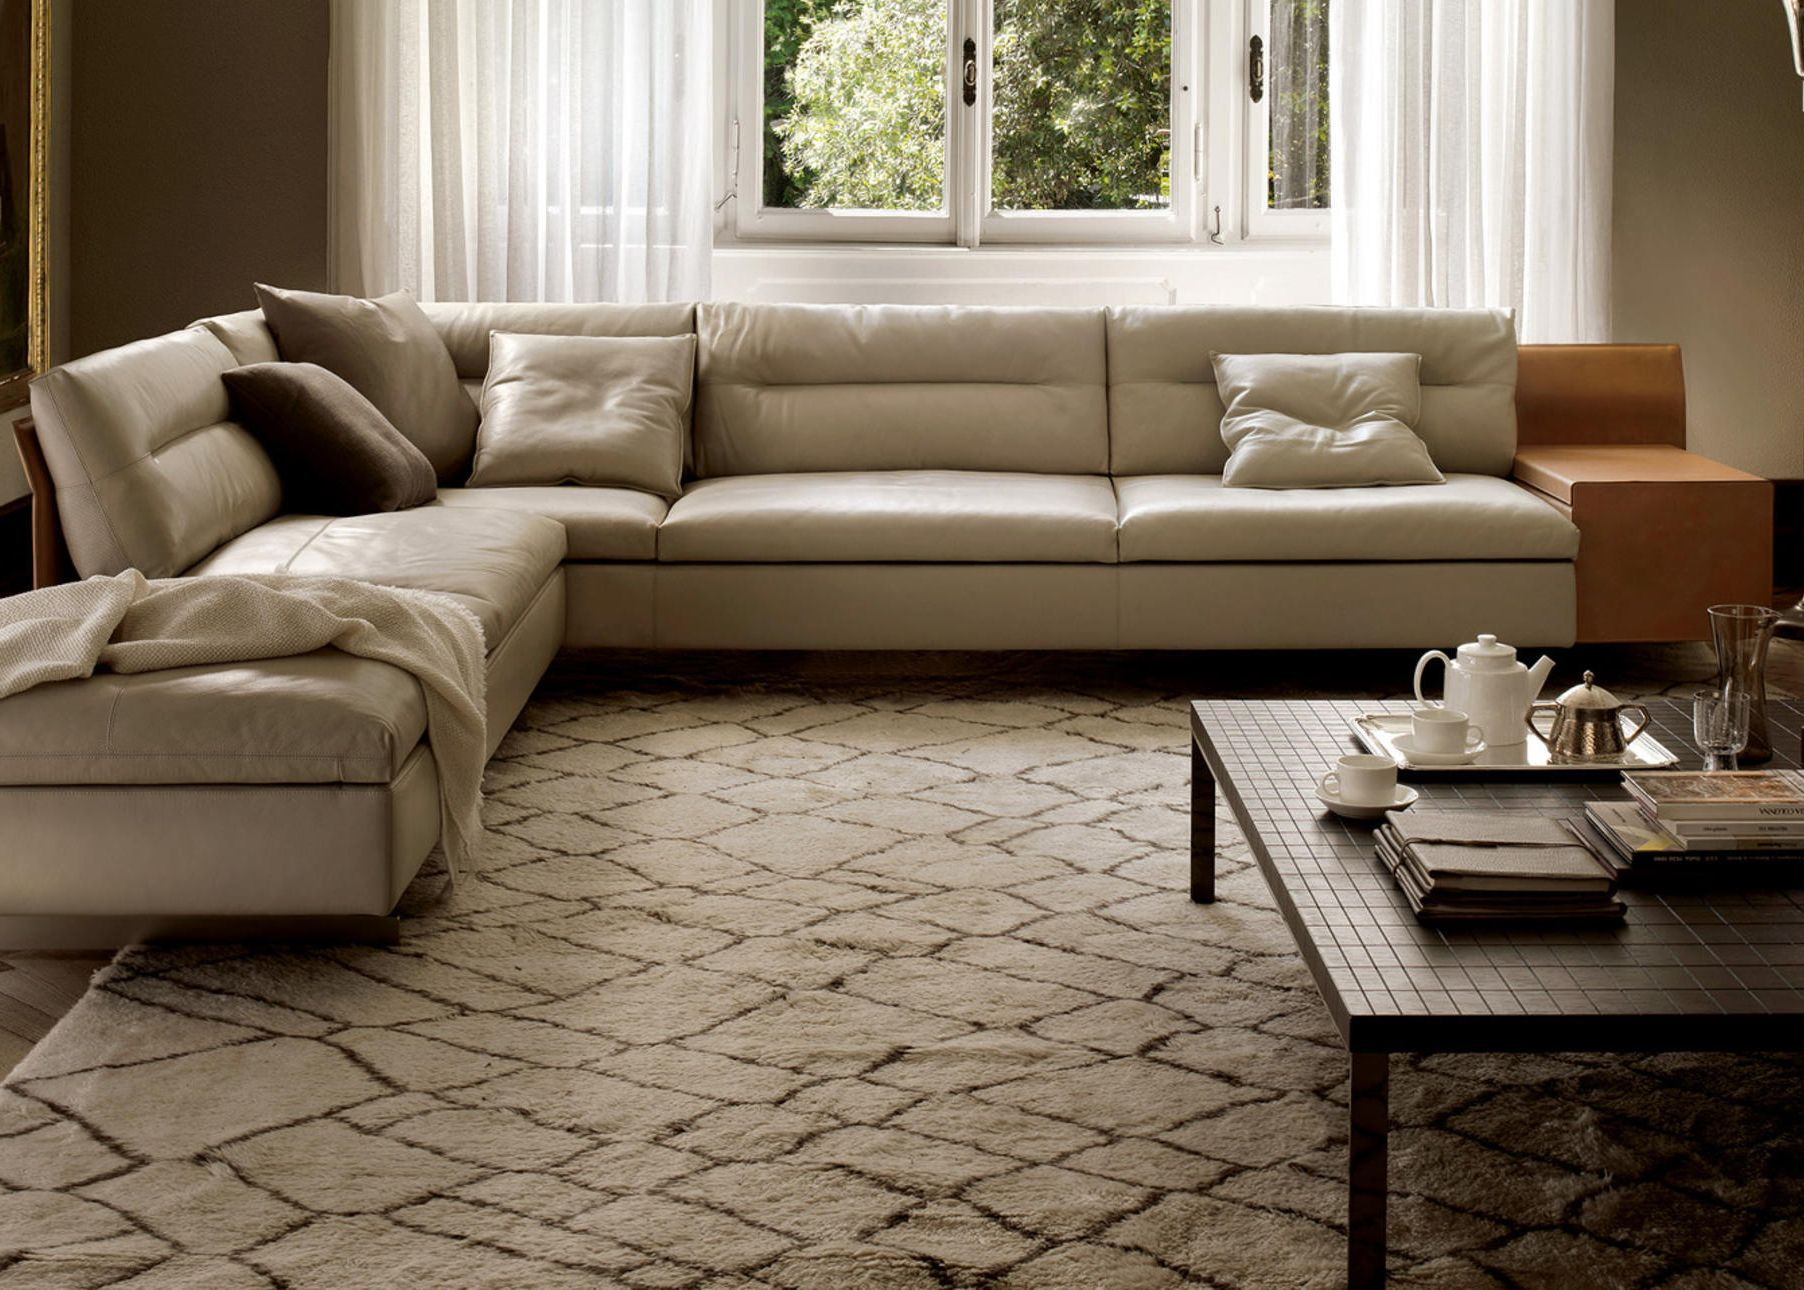 GranTorino, Poltrona Frau Italian furniture modern